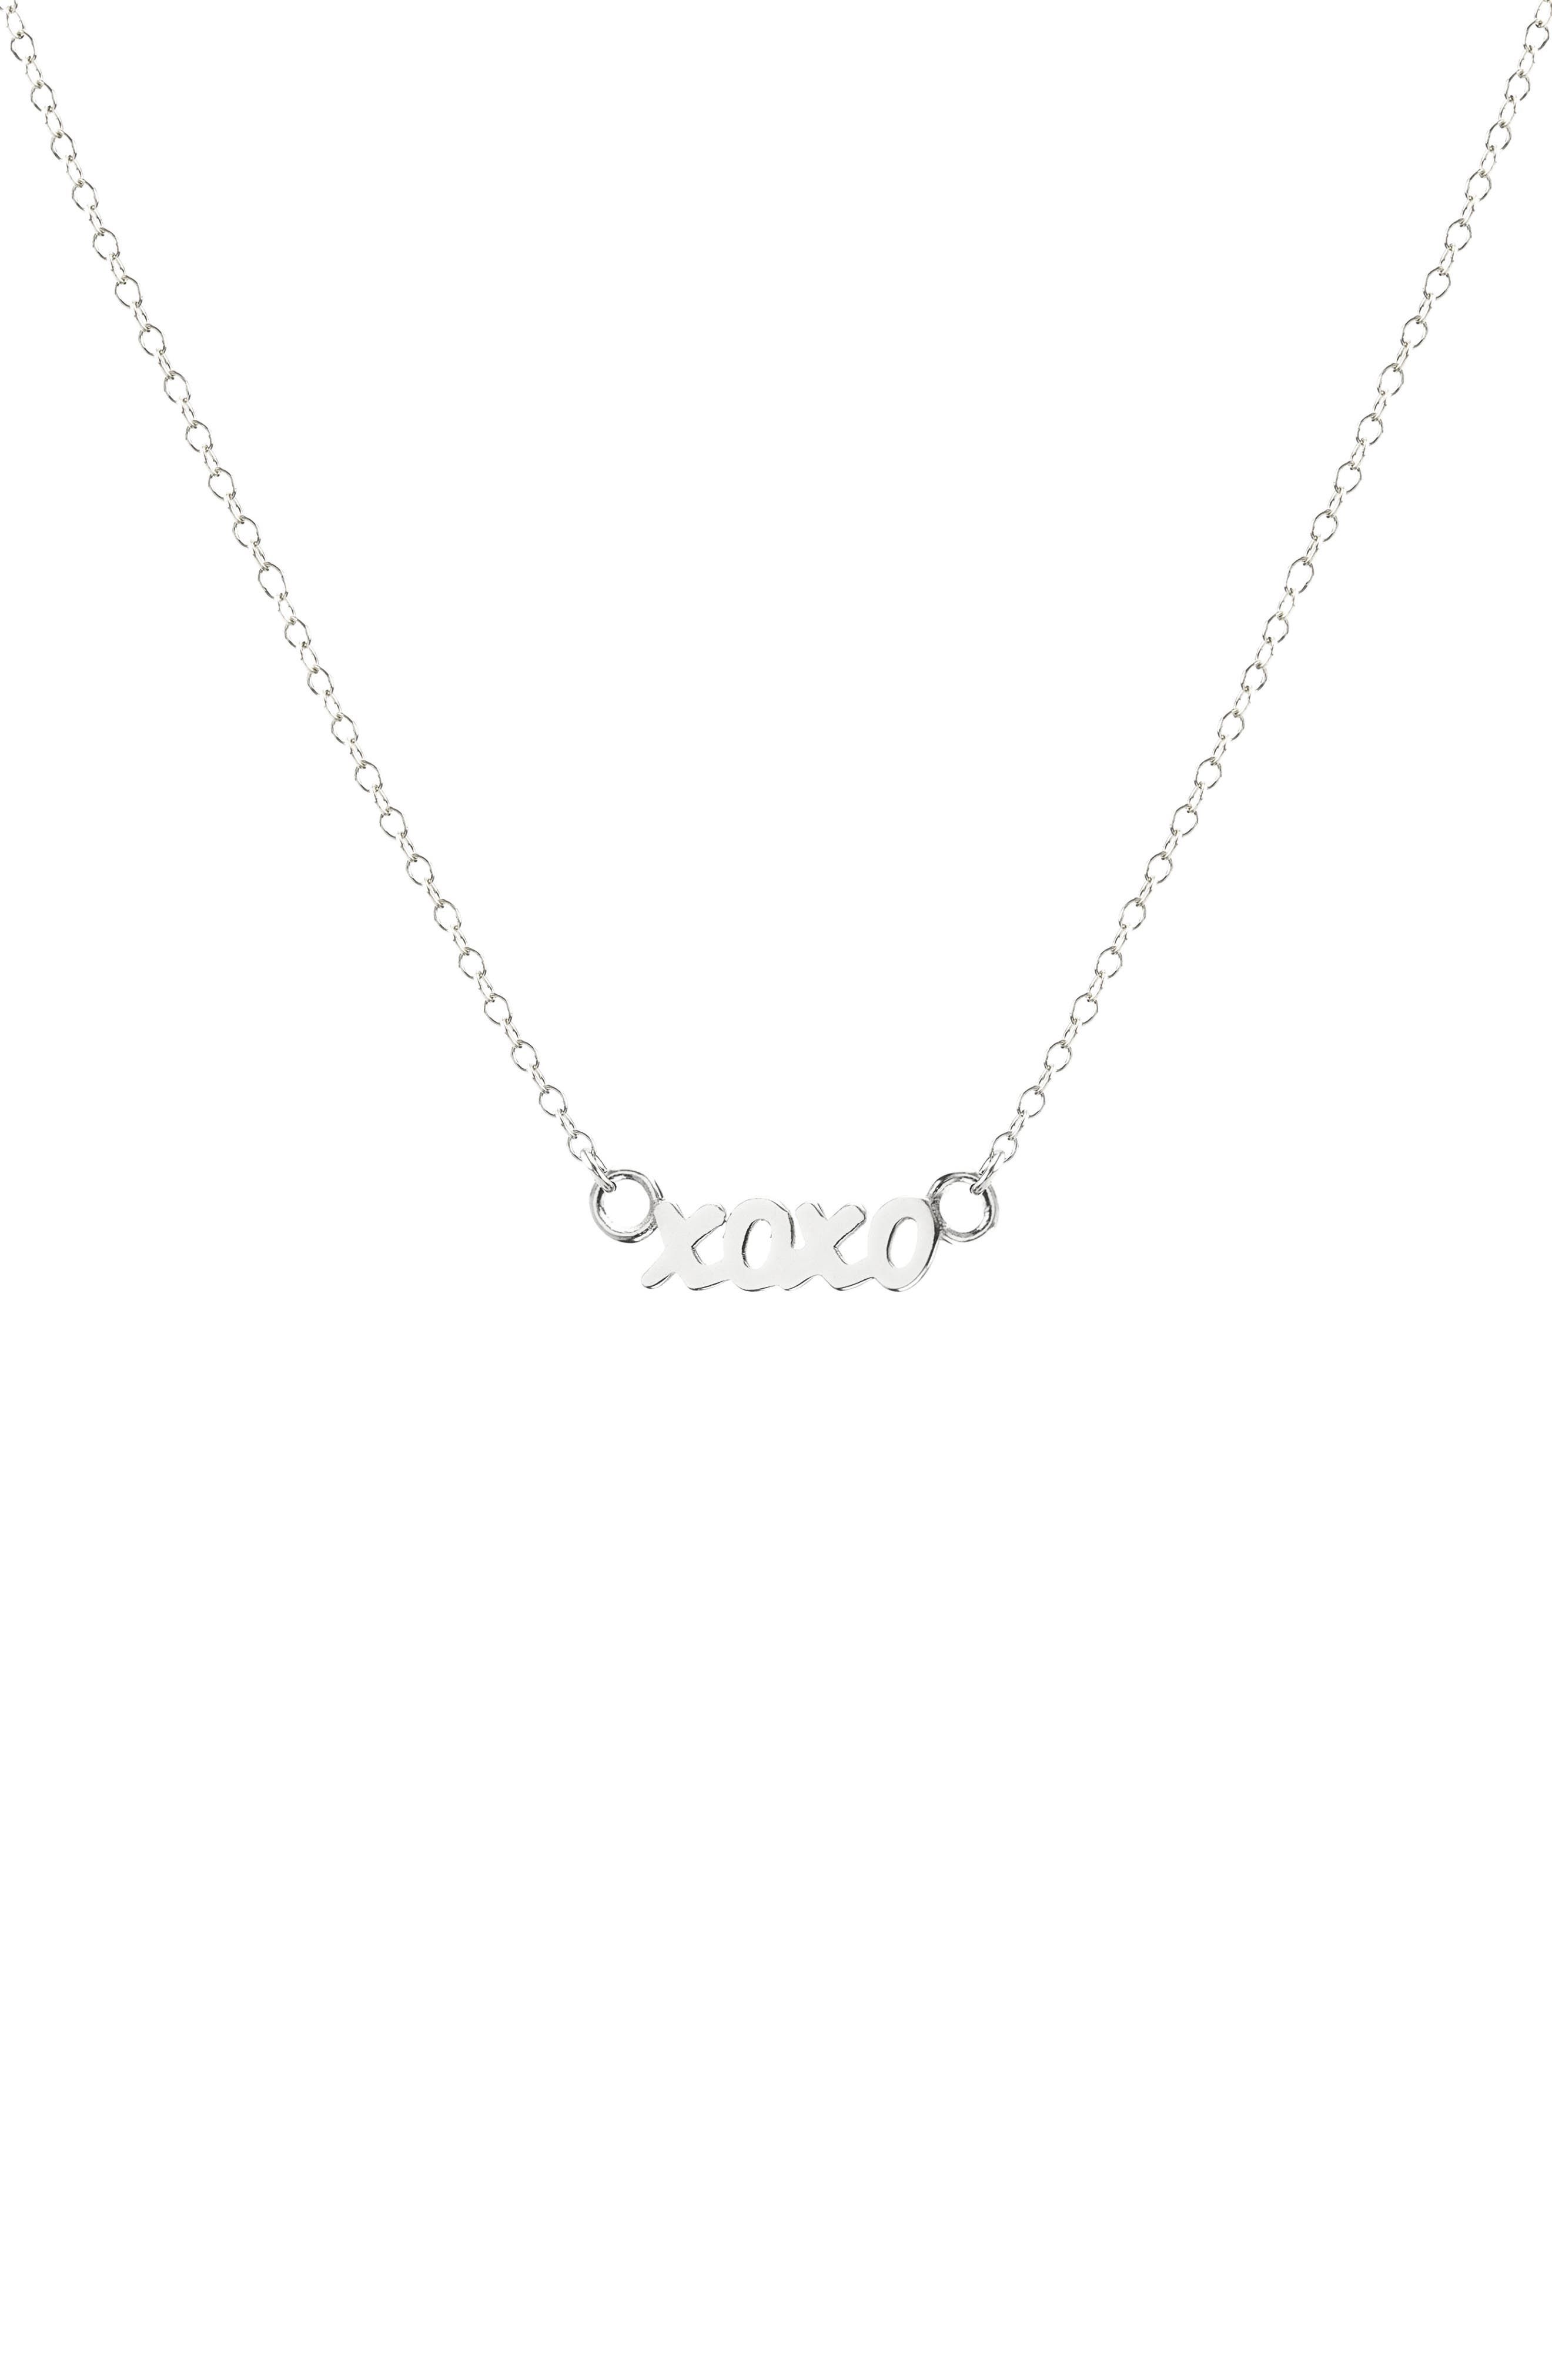 XOXO Script Necklace,                         Main,                         color, Silver